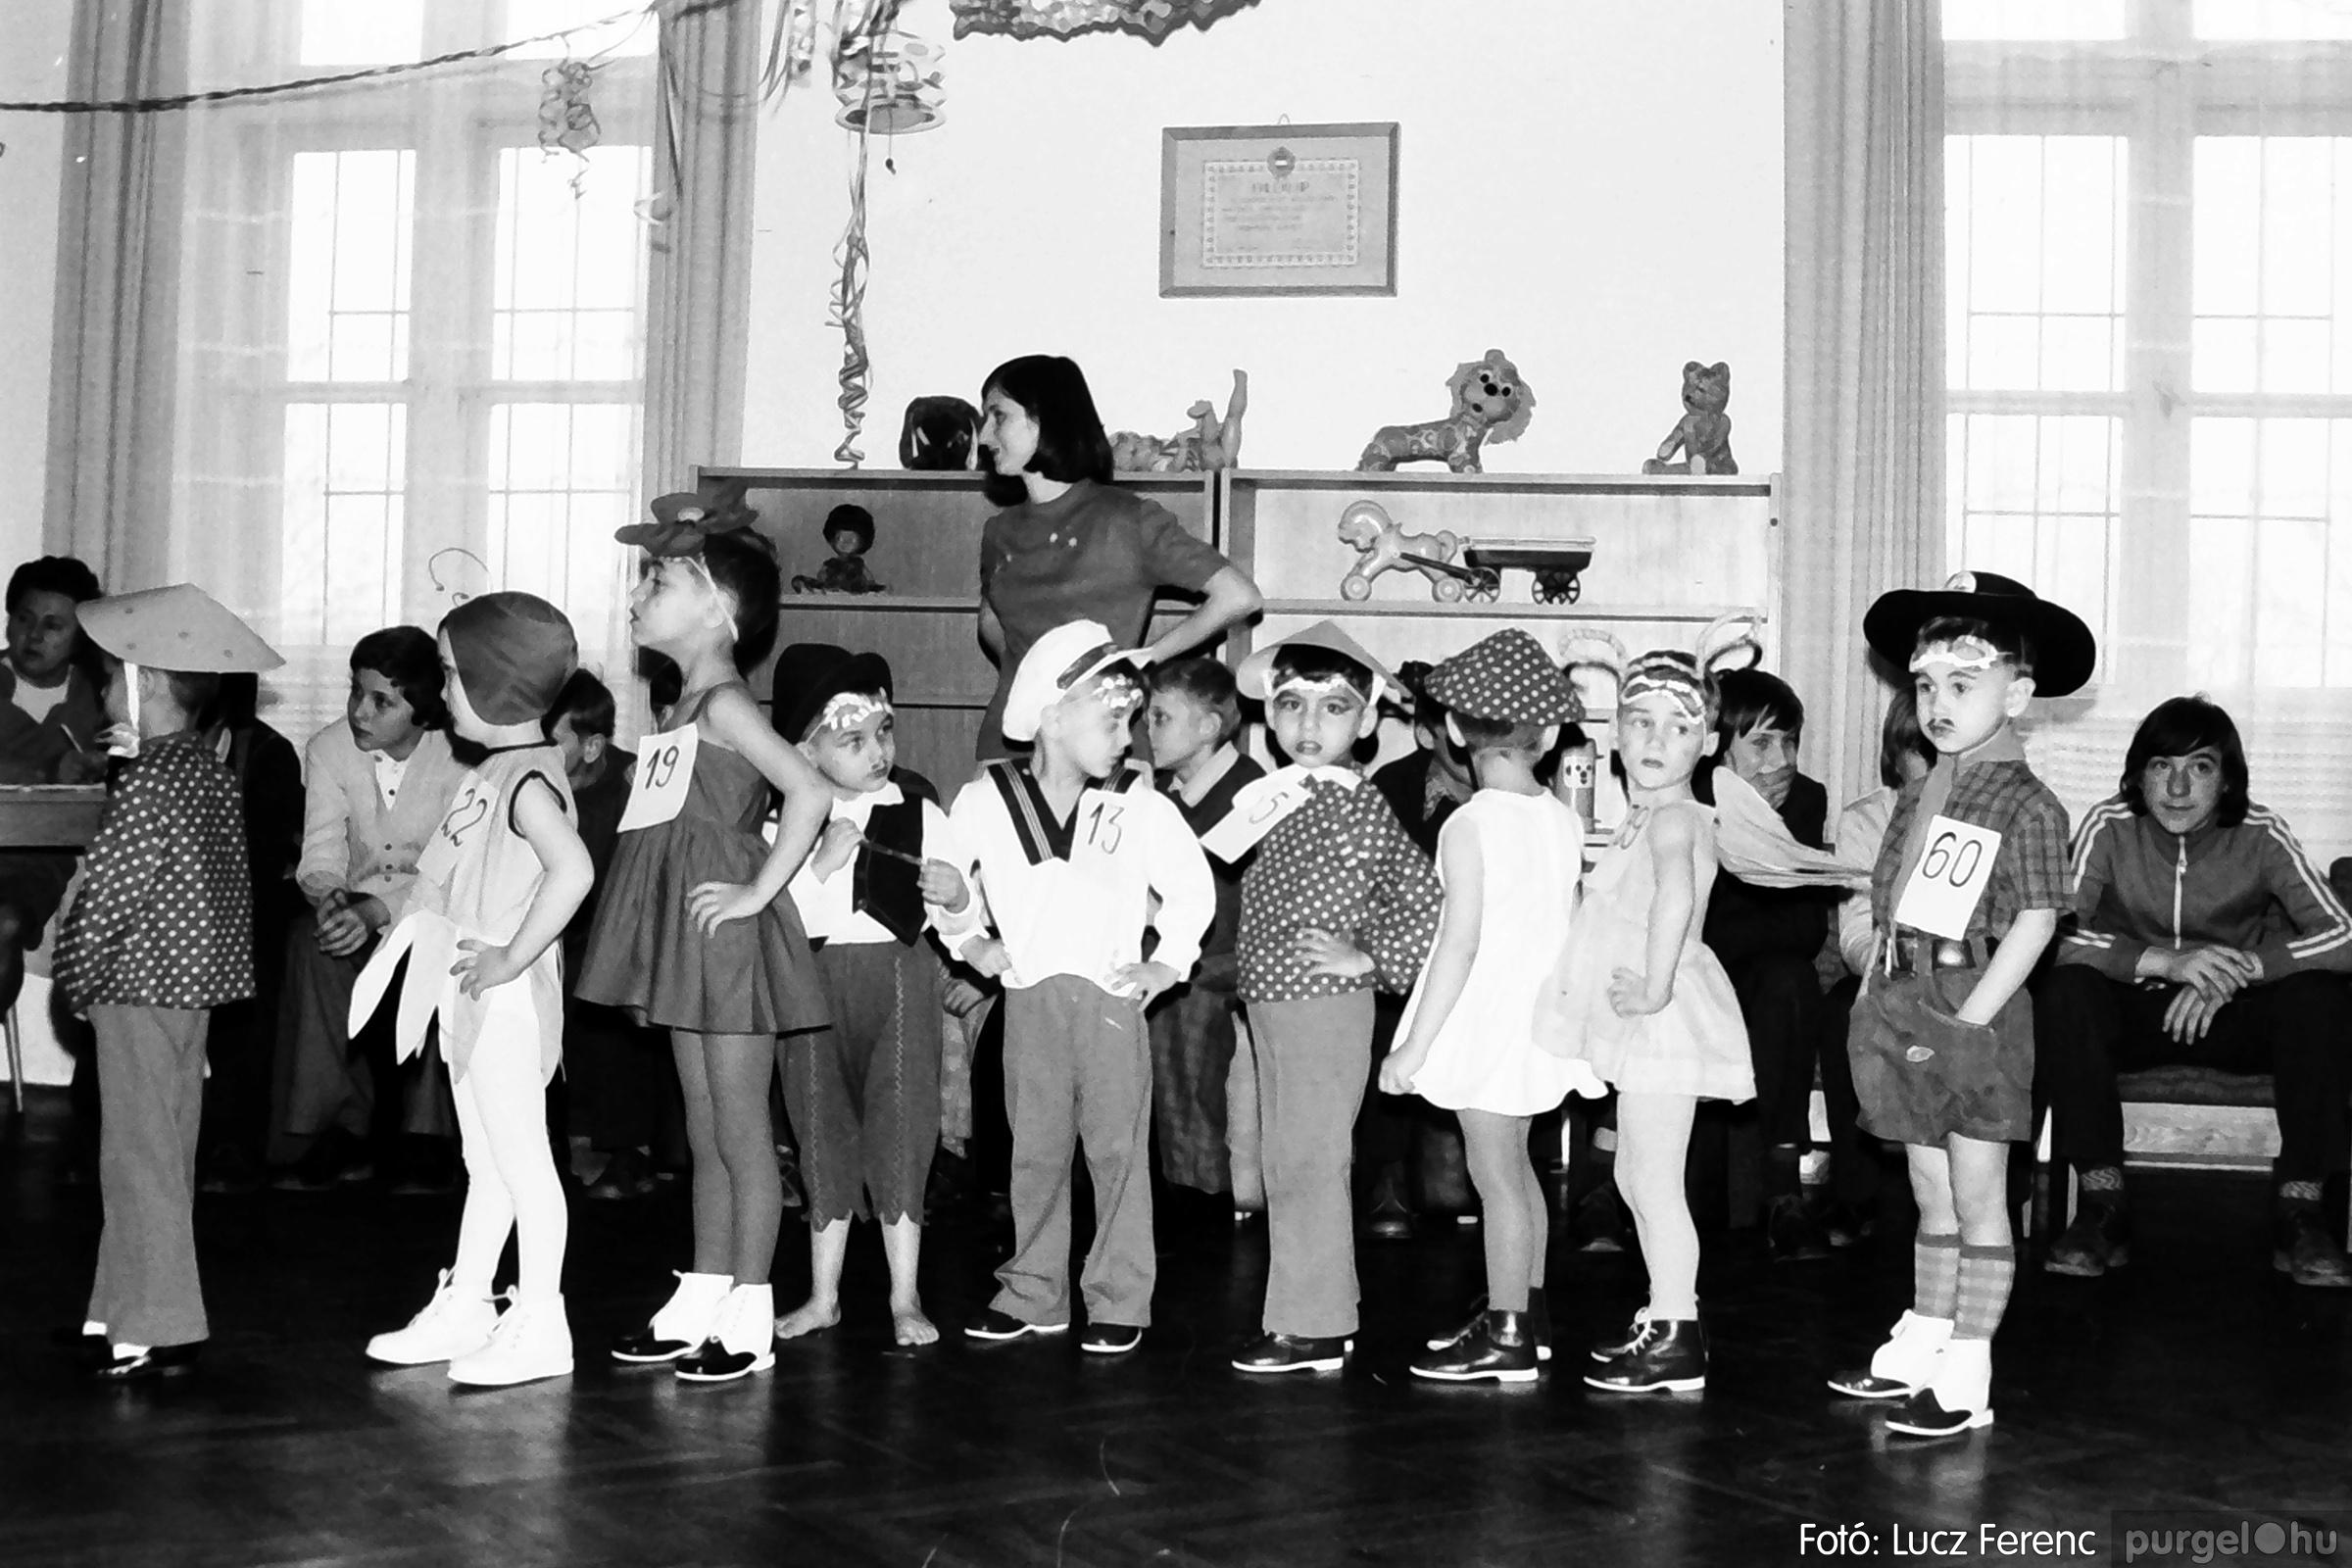 074. 1977. Farsang a gyermekotthonban 004. - Fotó: Lucz Ferenc.jpg